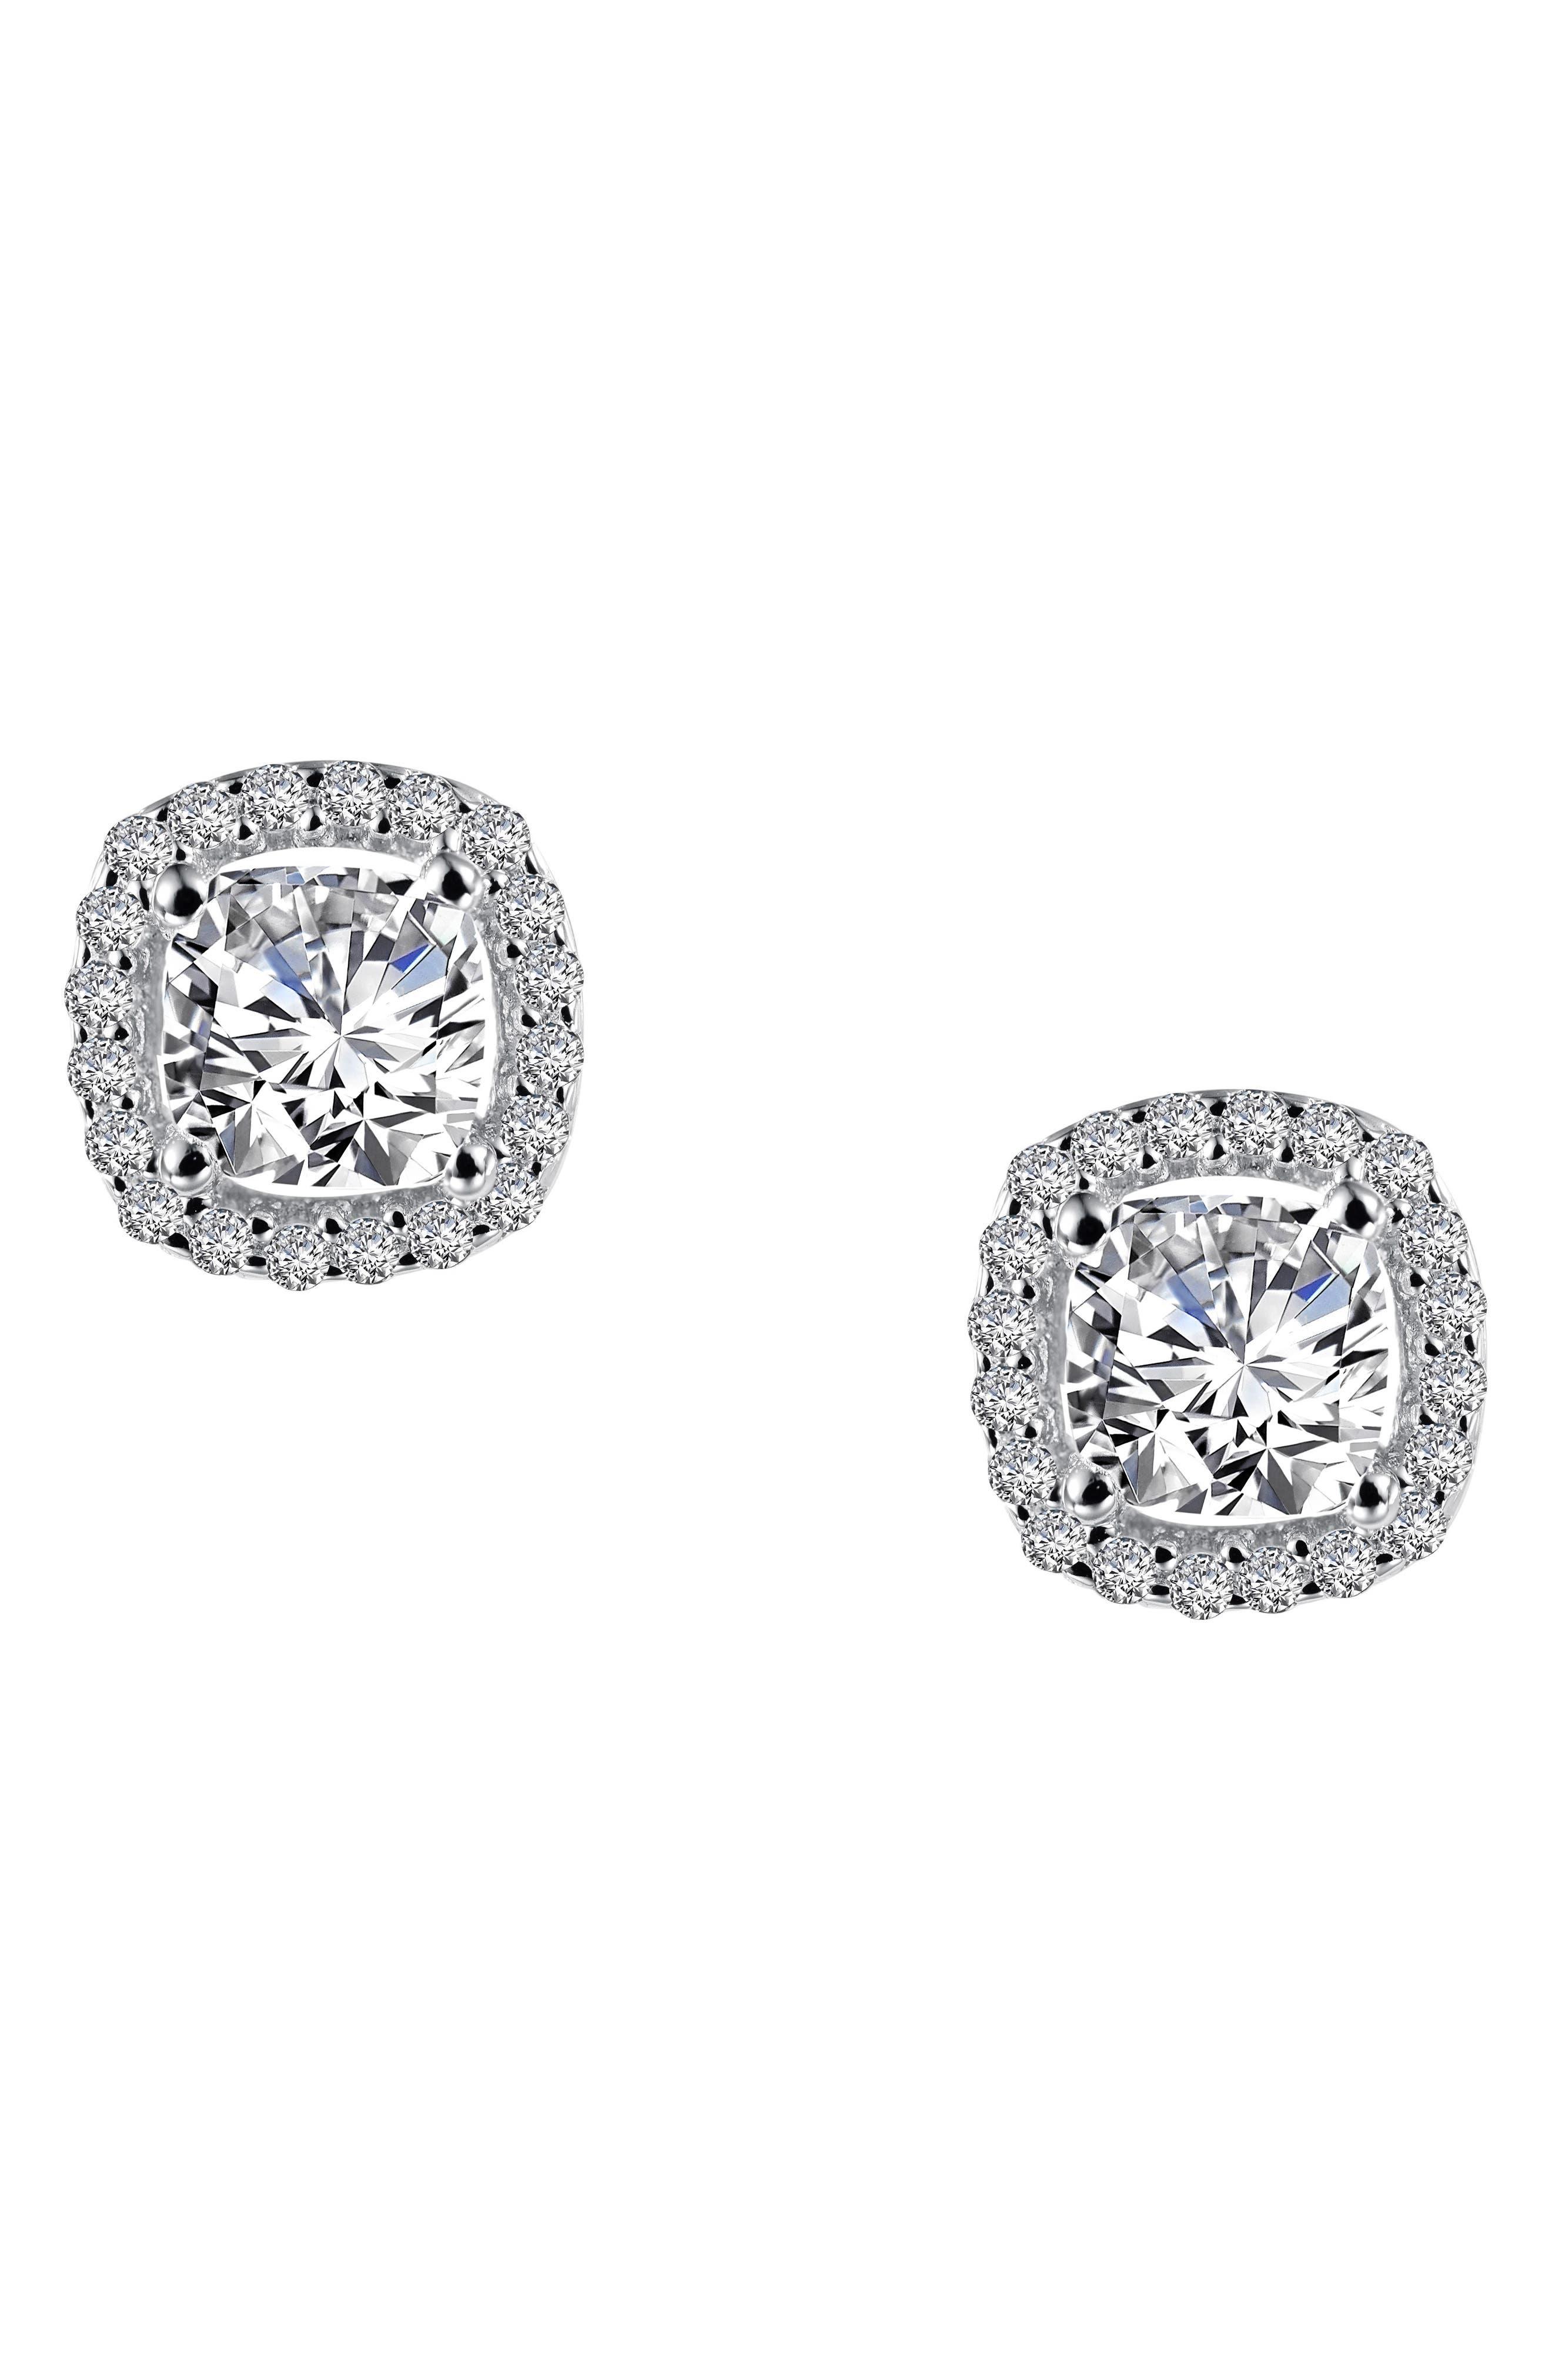 Cushion Cut Simulated Diamond Stud Earrings,                             Alternate thumbnail 3, color,                             SILVER/ CLEAR